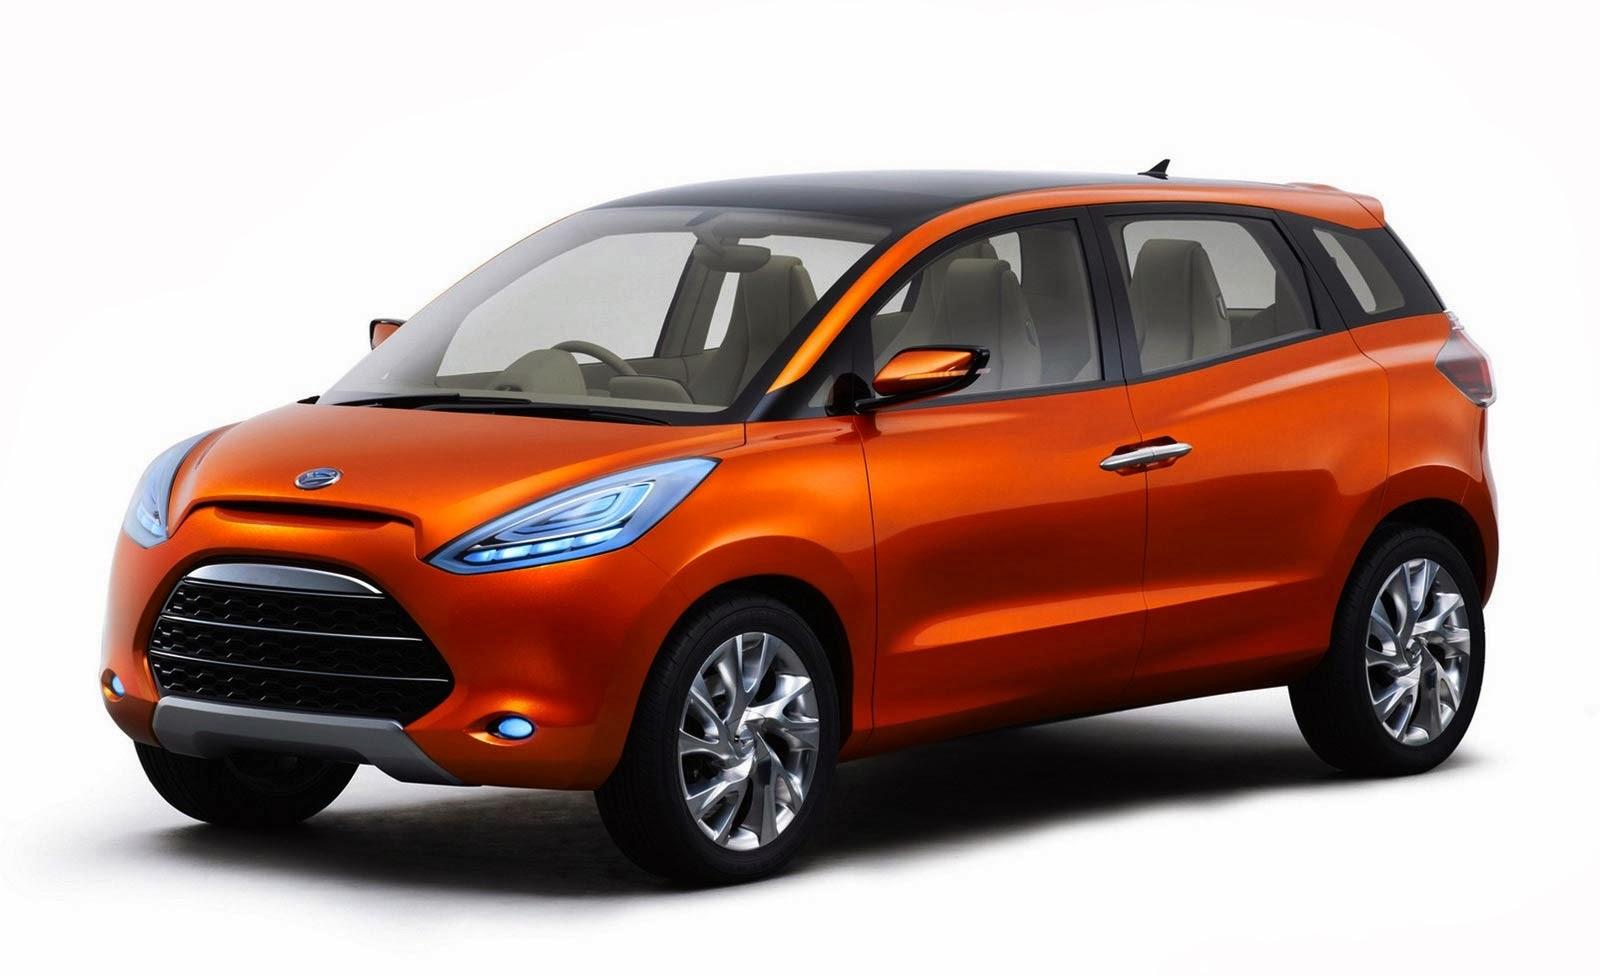 Harga Grand All New Avanza 2016 Camry Mobil Baru Di Bali You